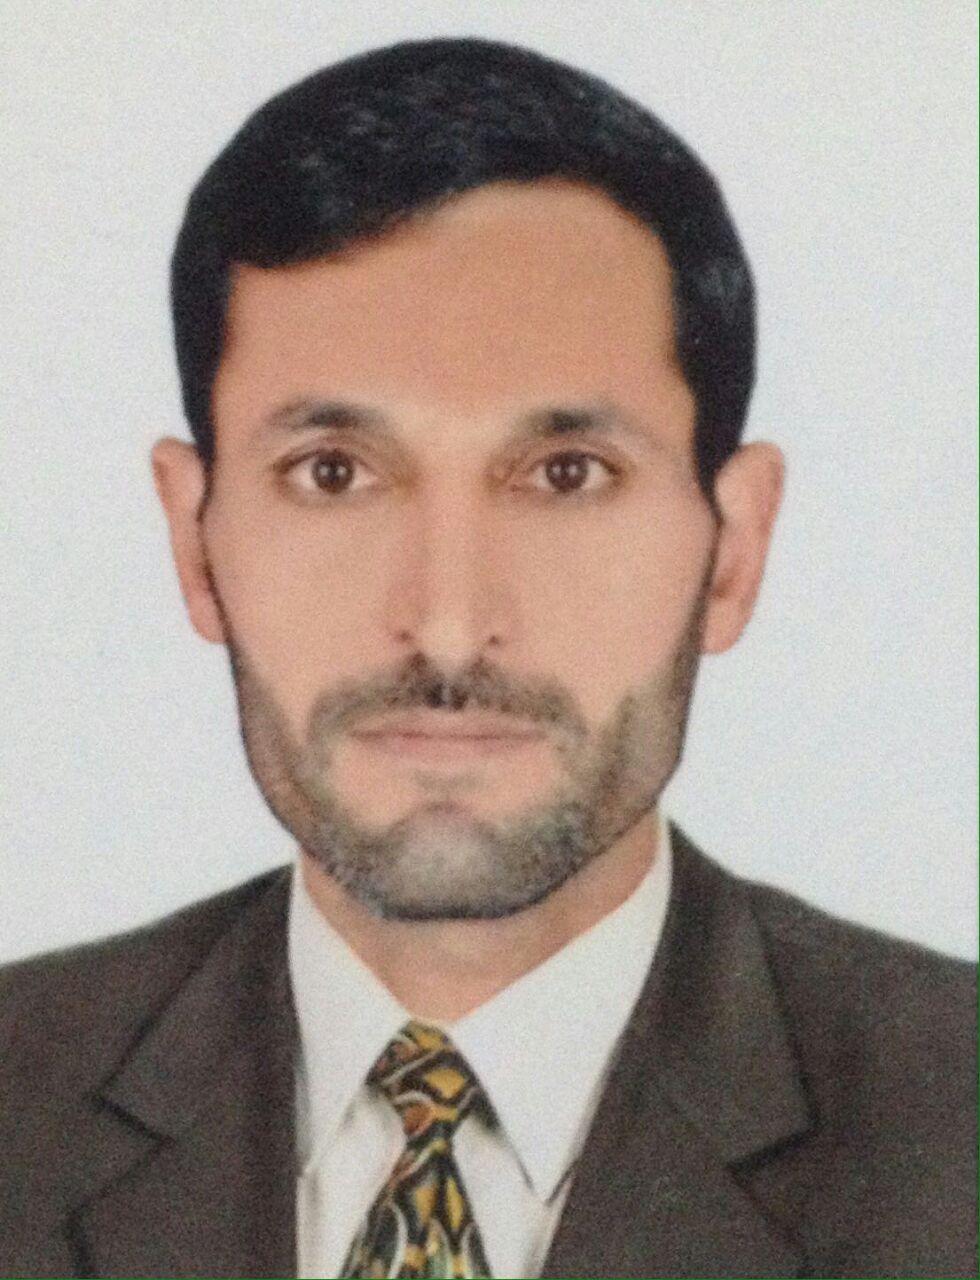 ِAhmed Resan Sahan